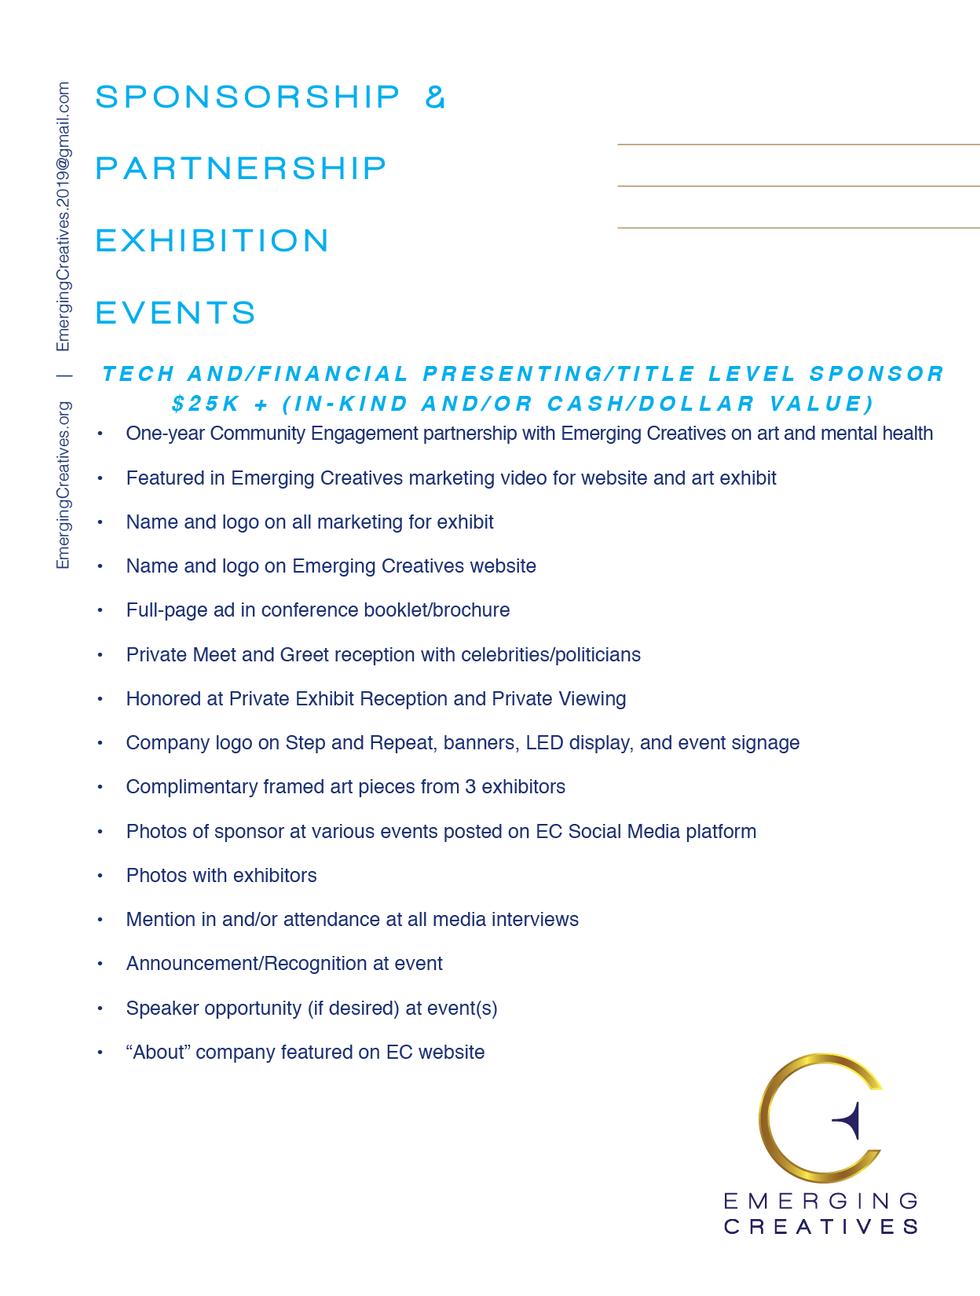 Emerging Creatives Sponsorship Sponsorsh